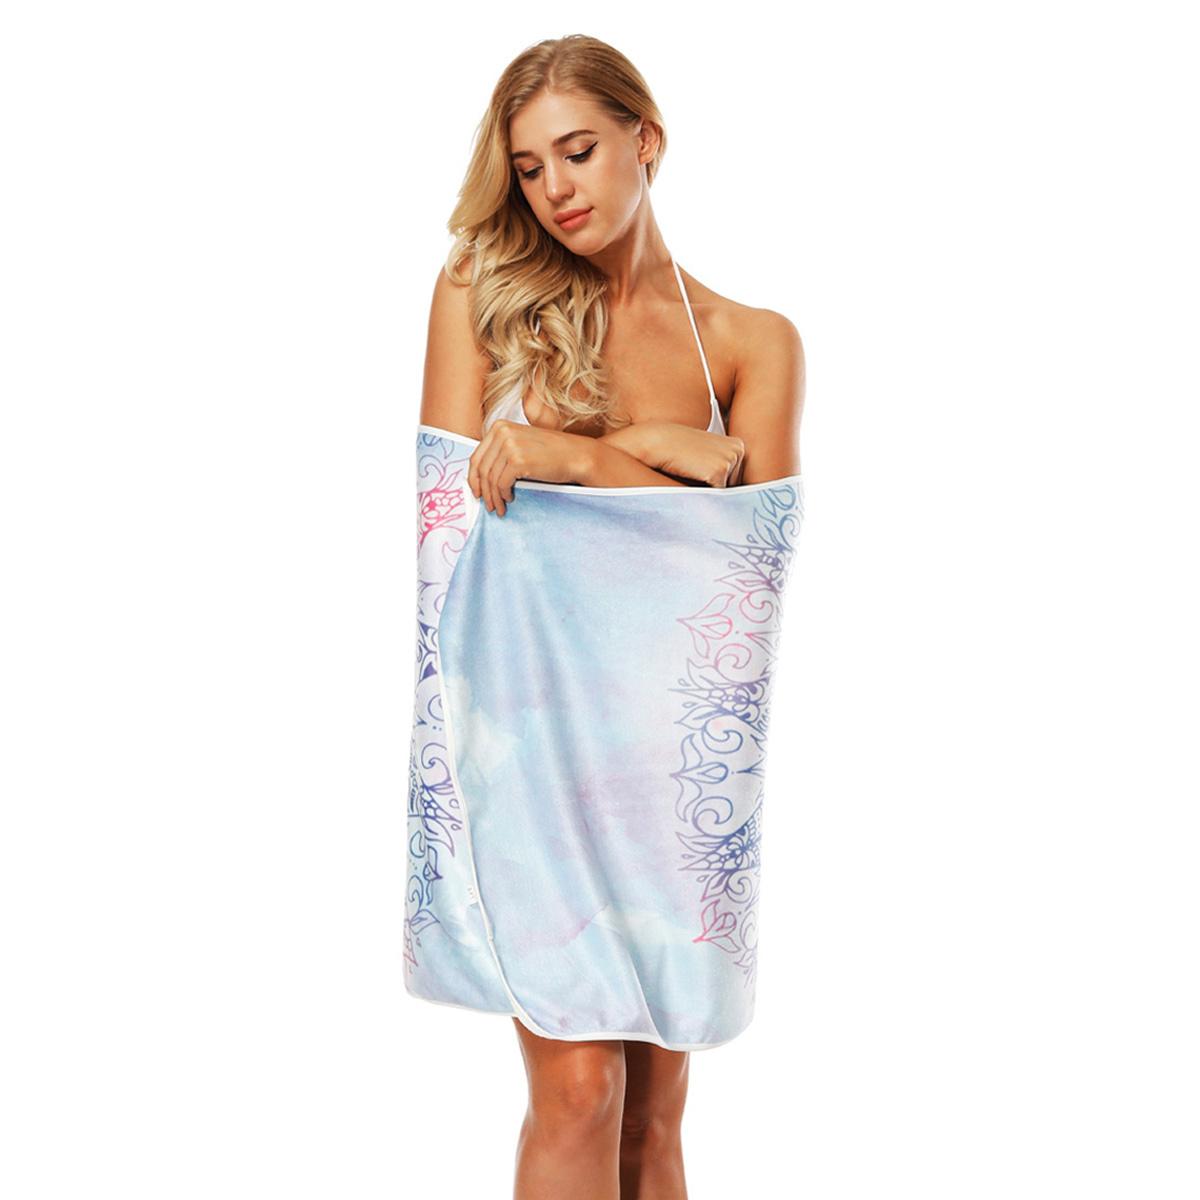 Beach bikini towel very pity